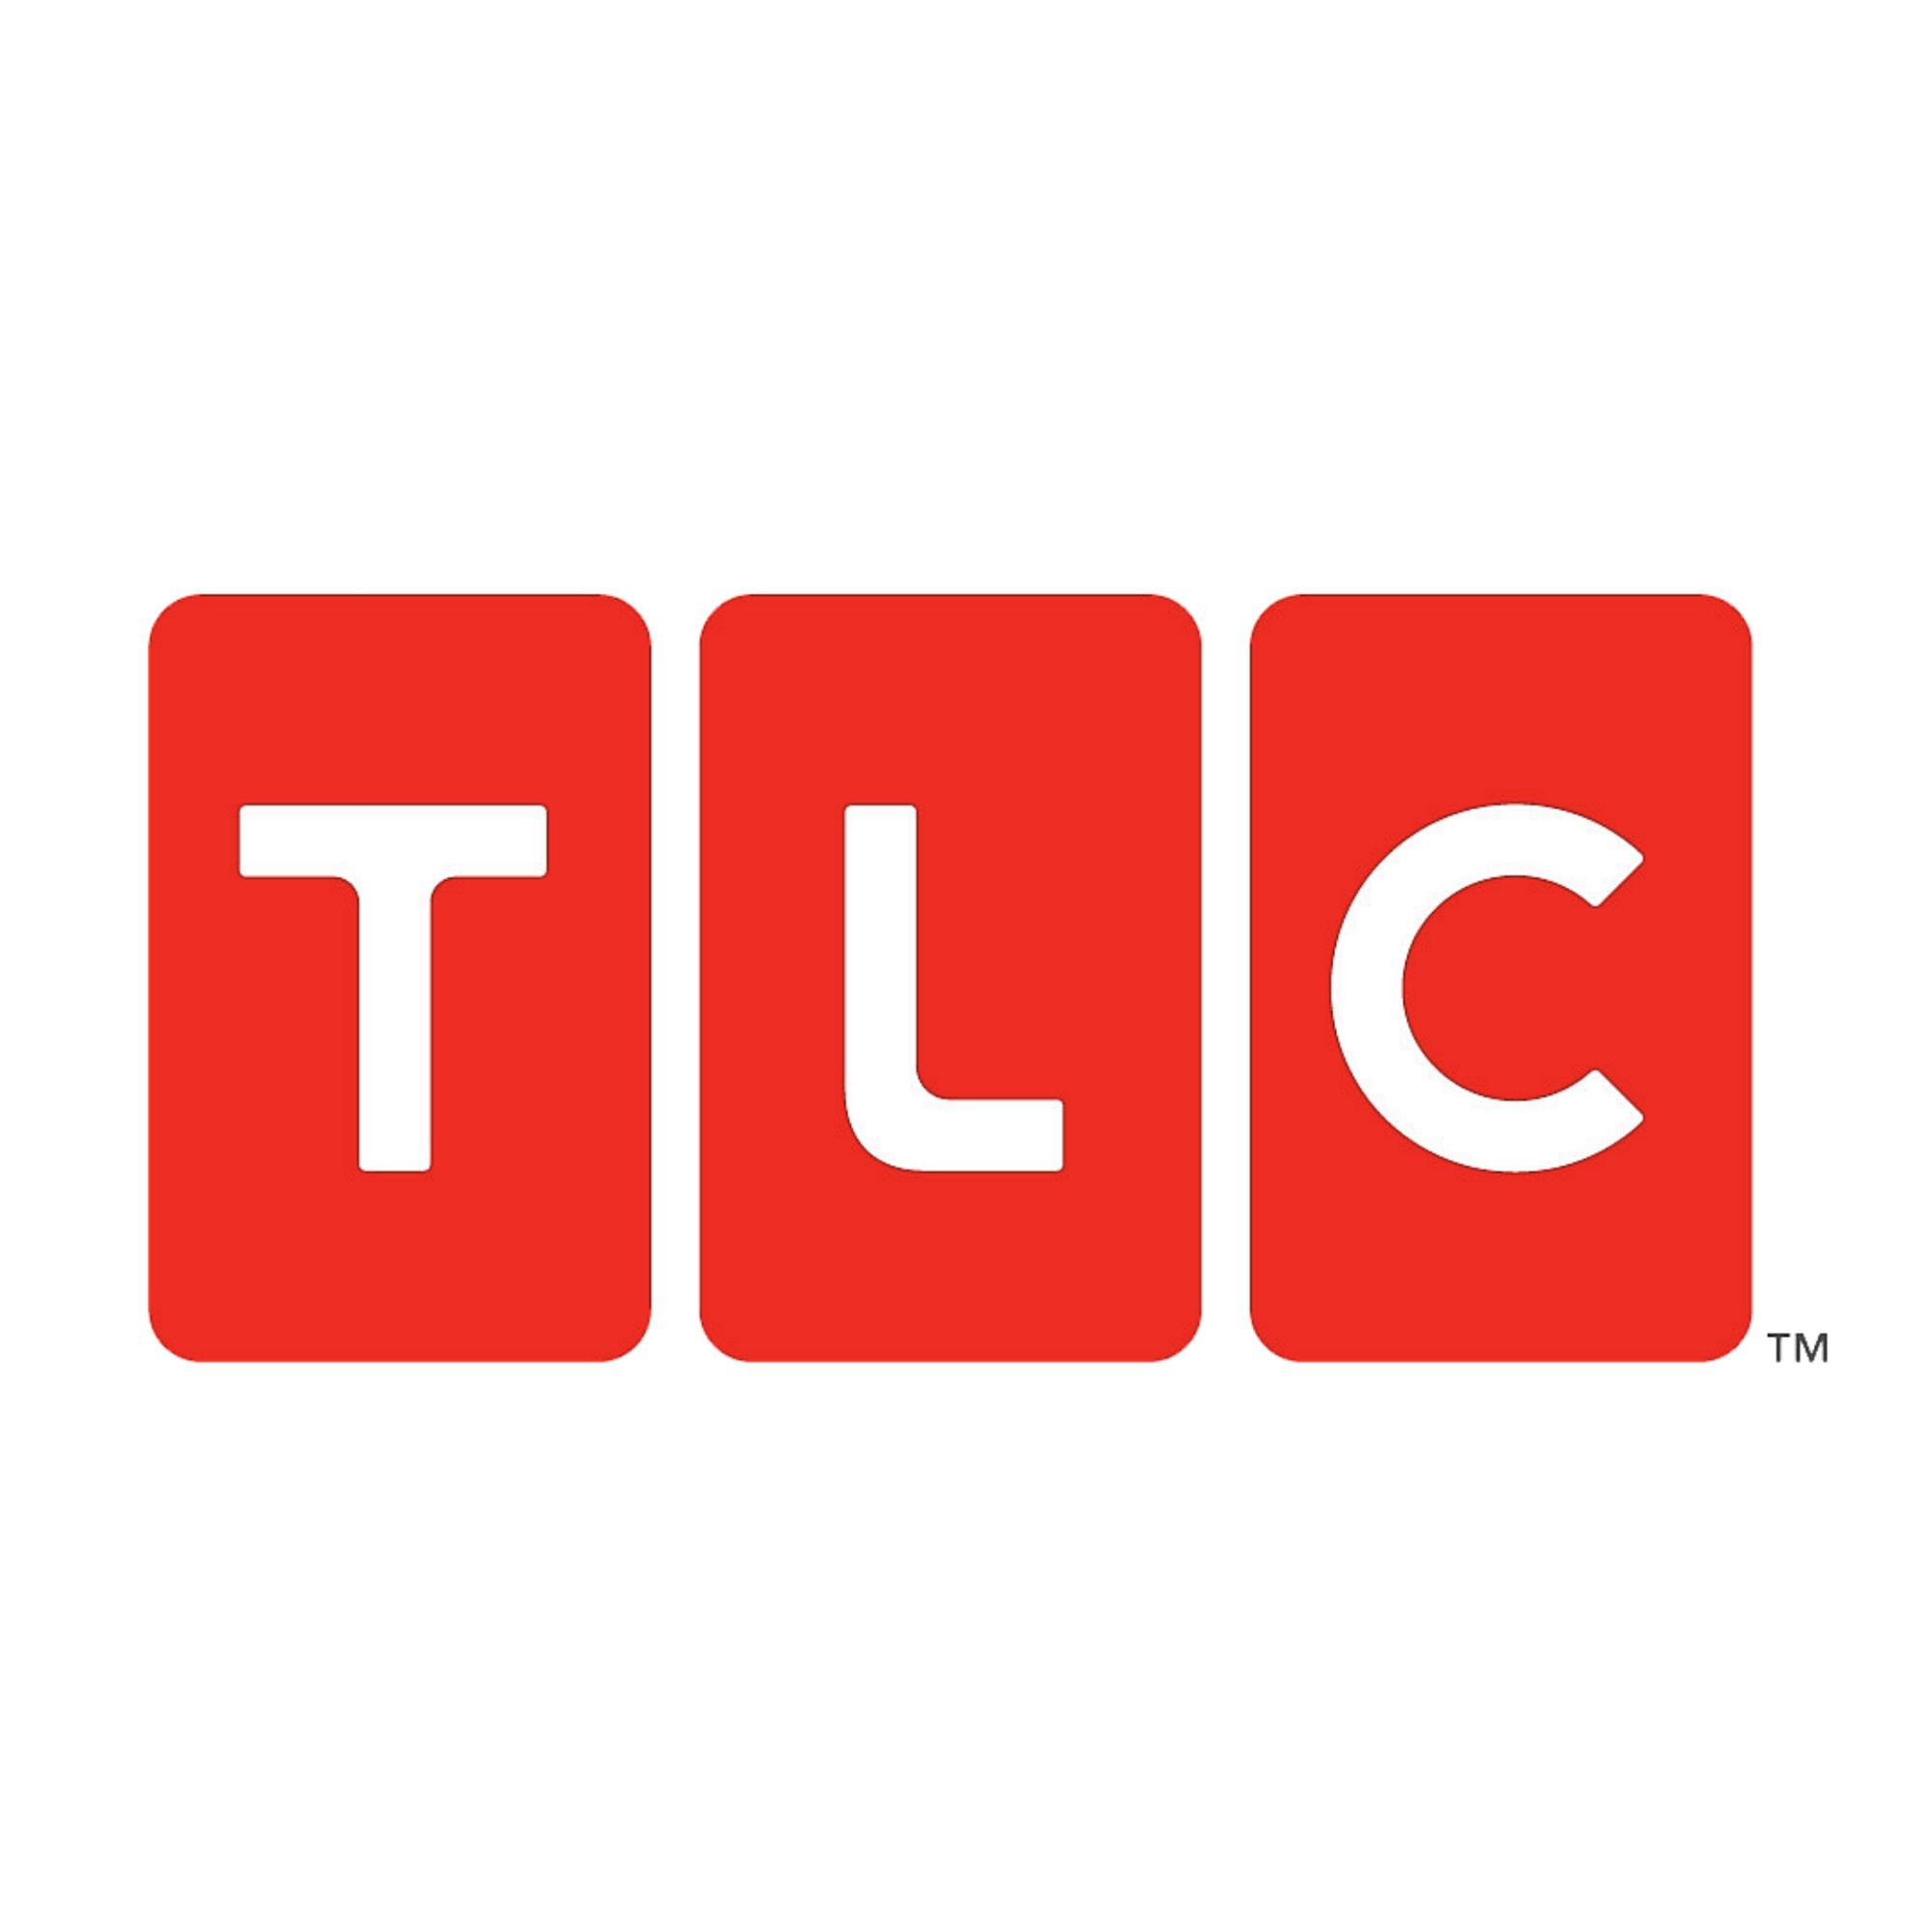 tlccc.jpg